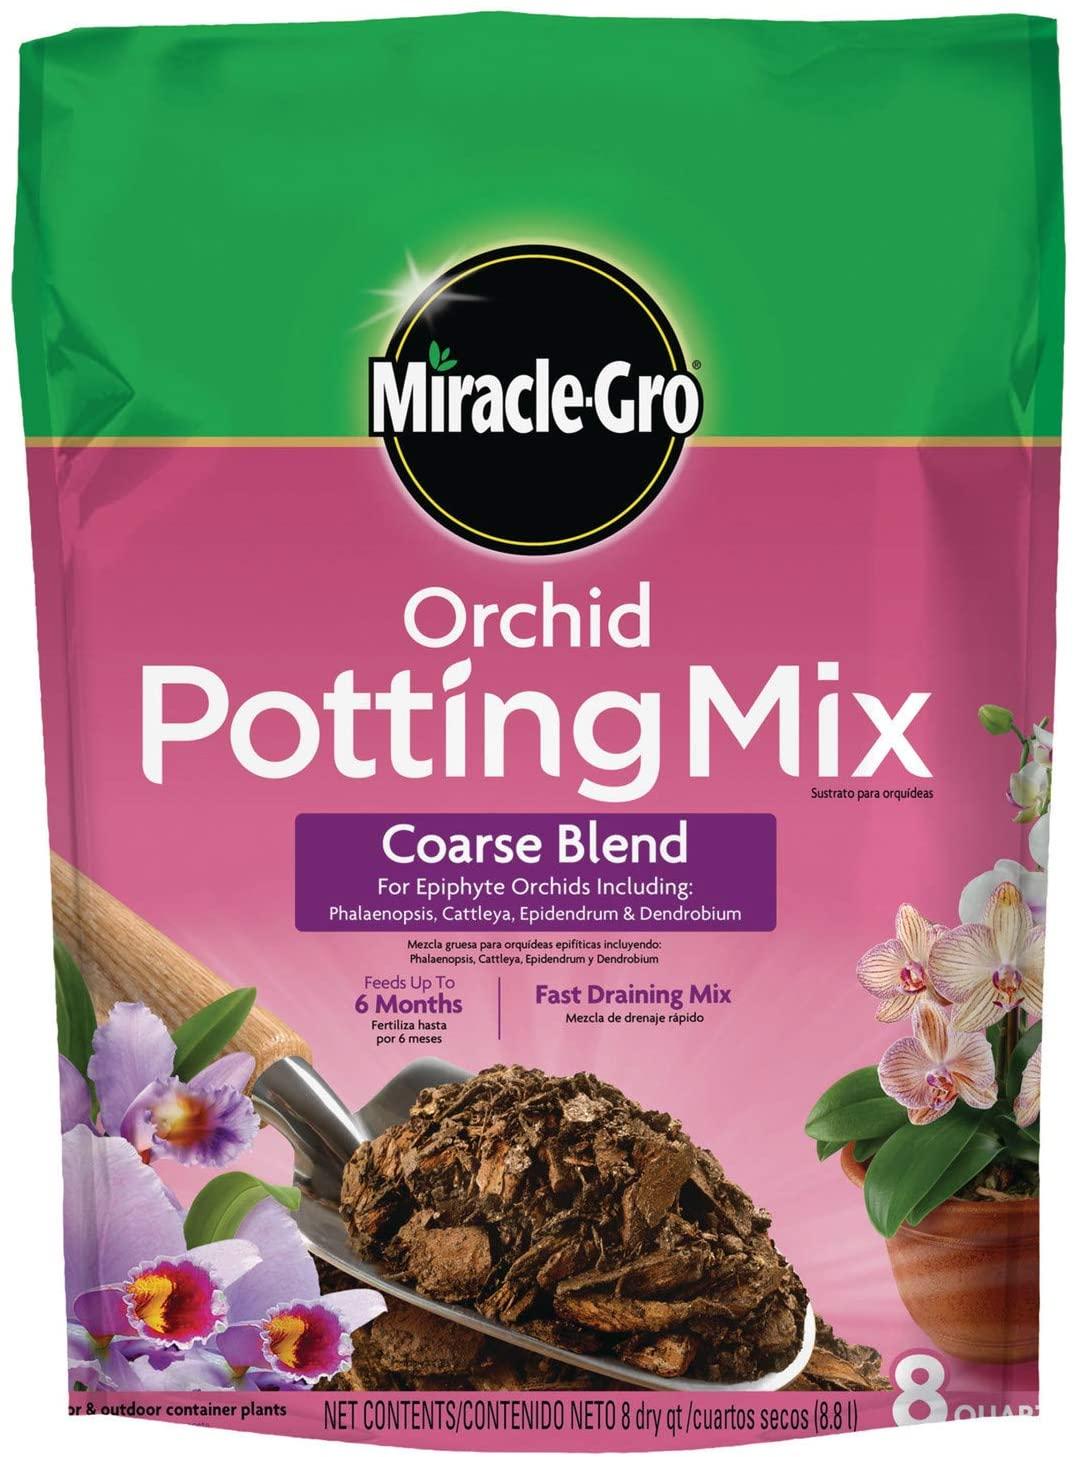 Miracle-Gro Orchid Potting Mix Coarse Blend, 8 qt.